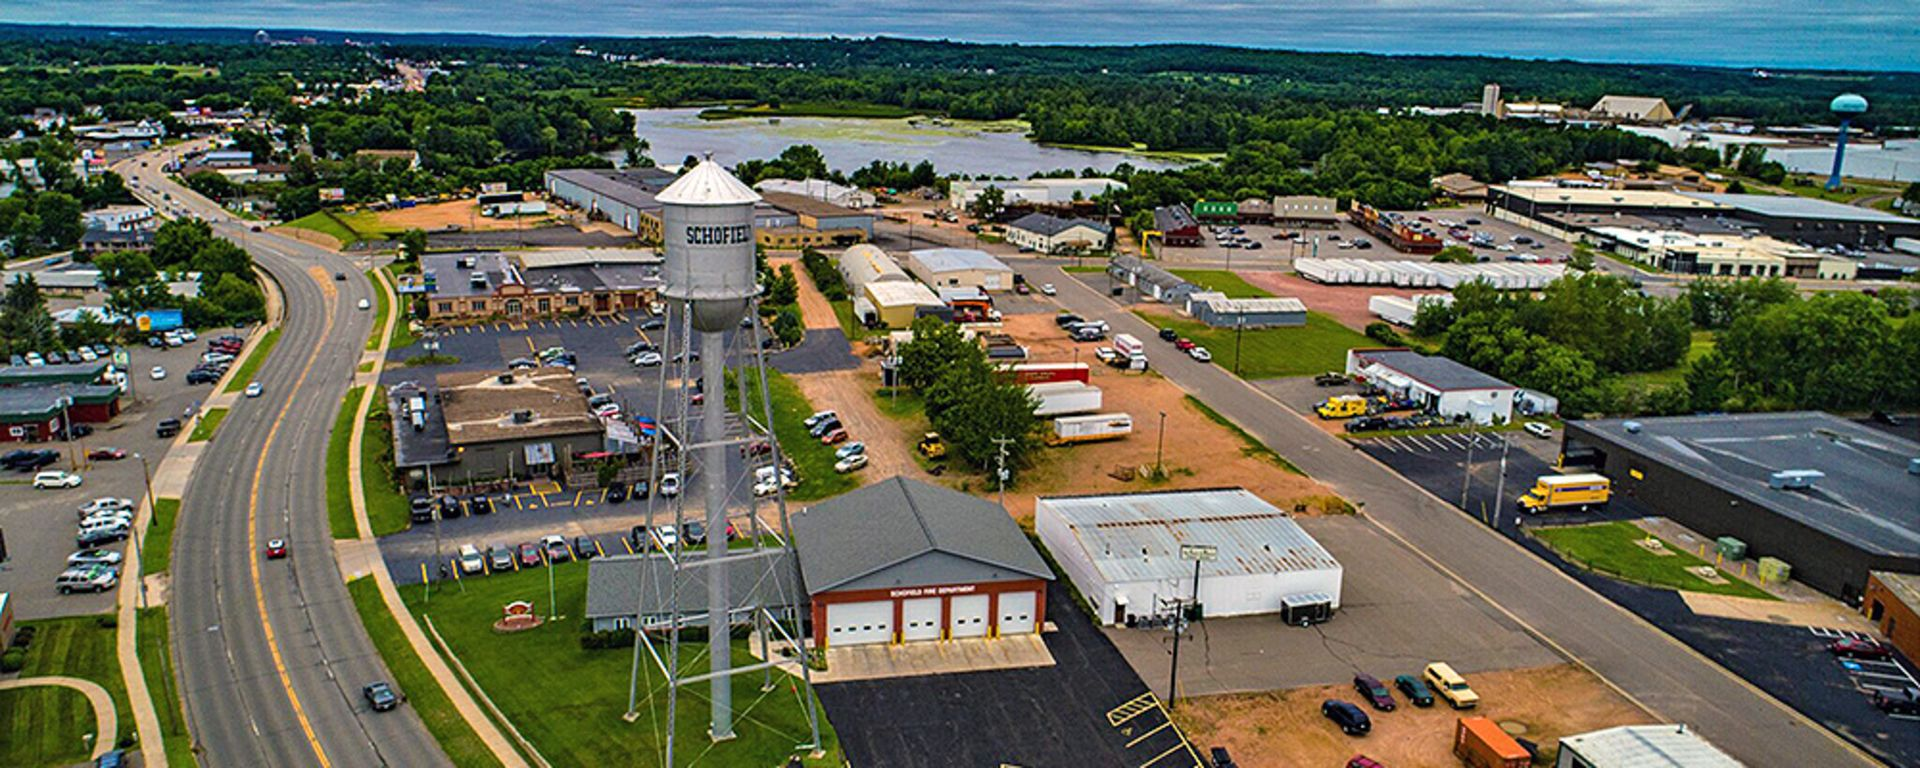 Schofield, Wisconsin